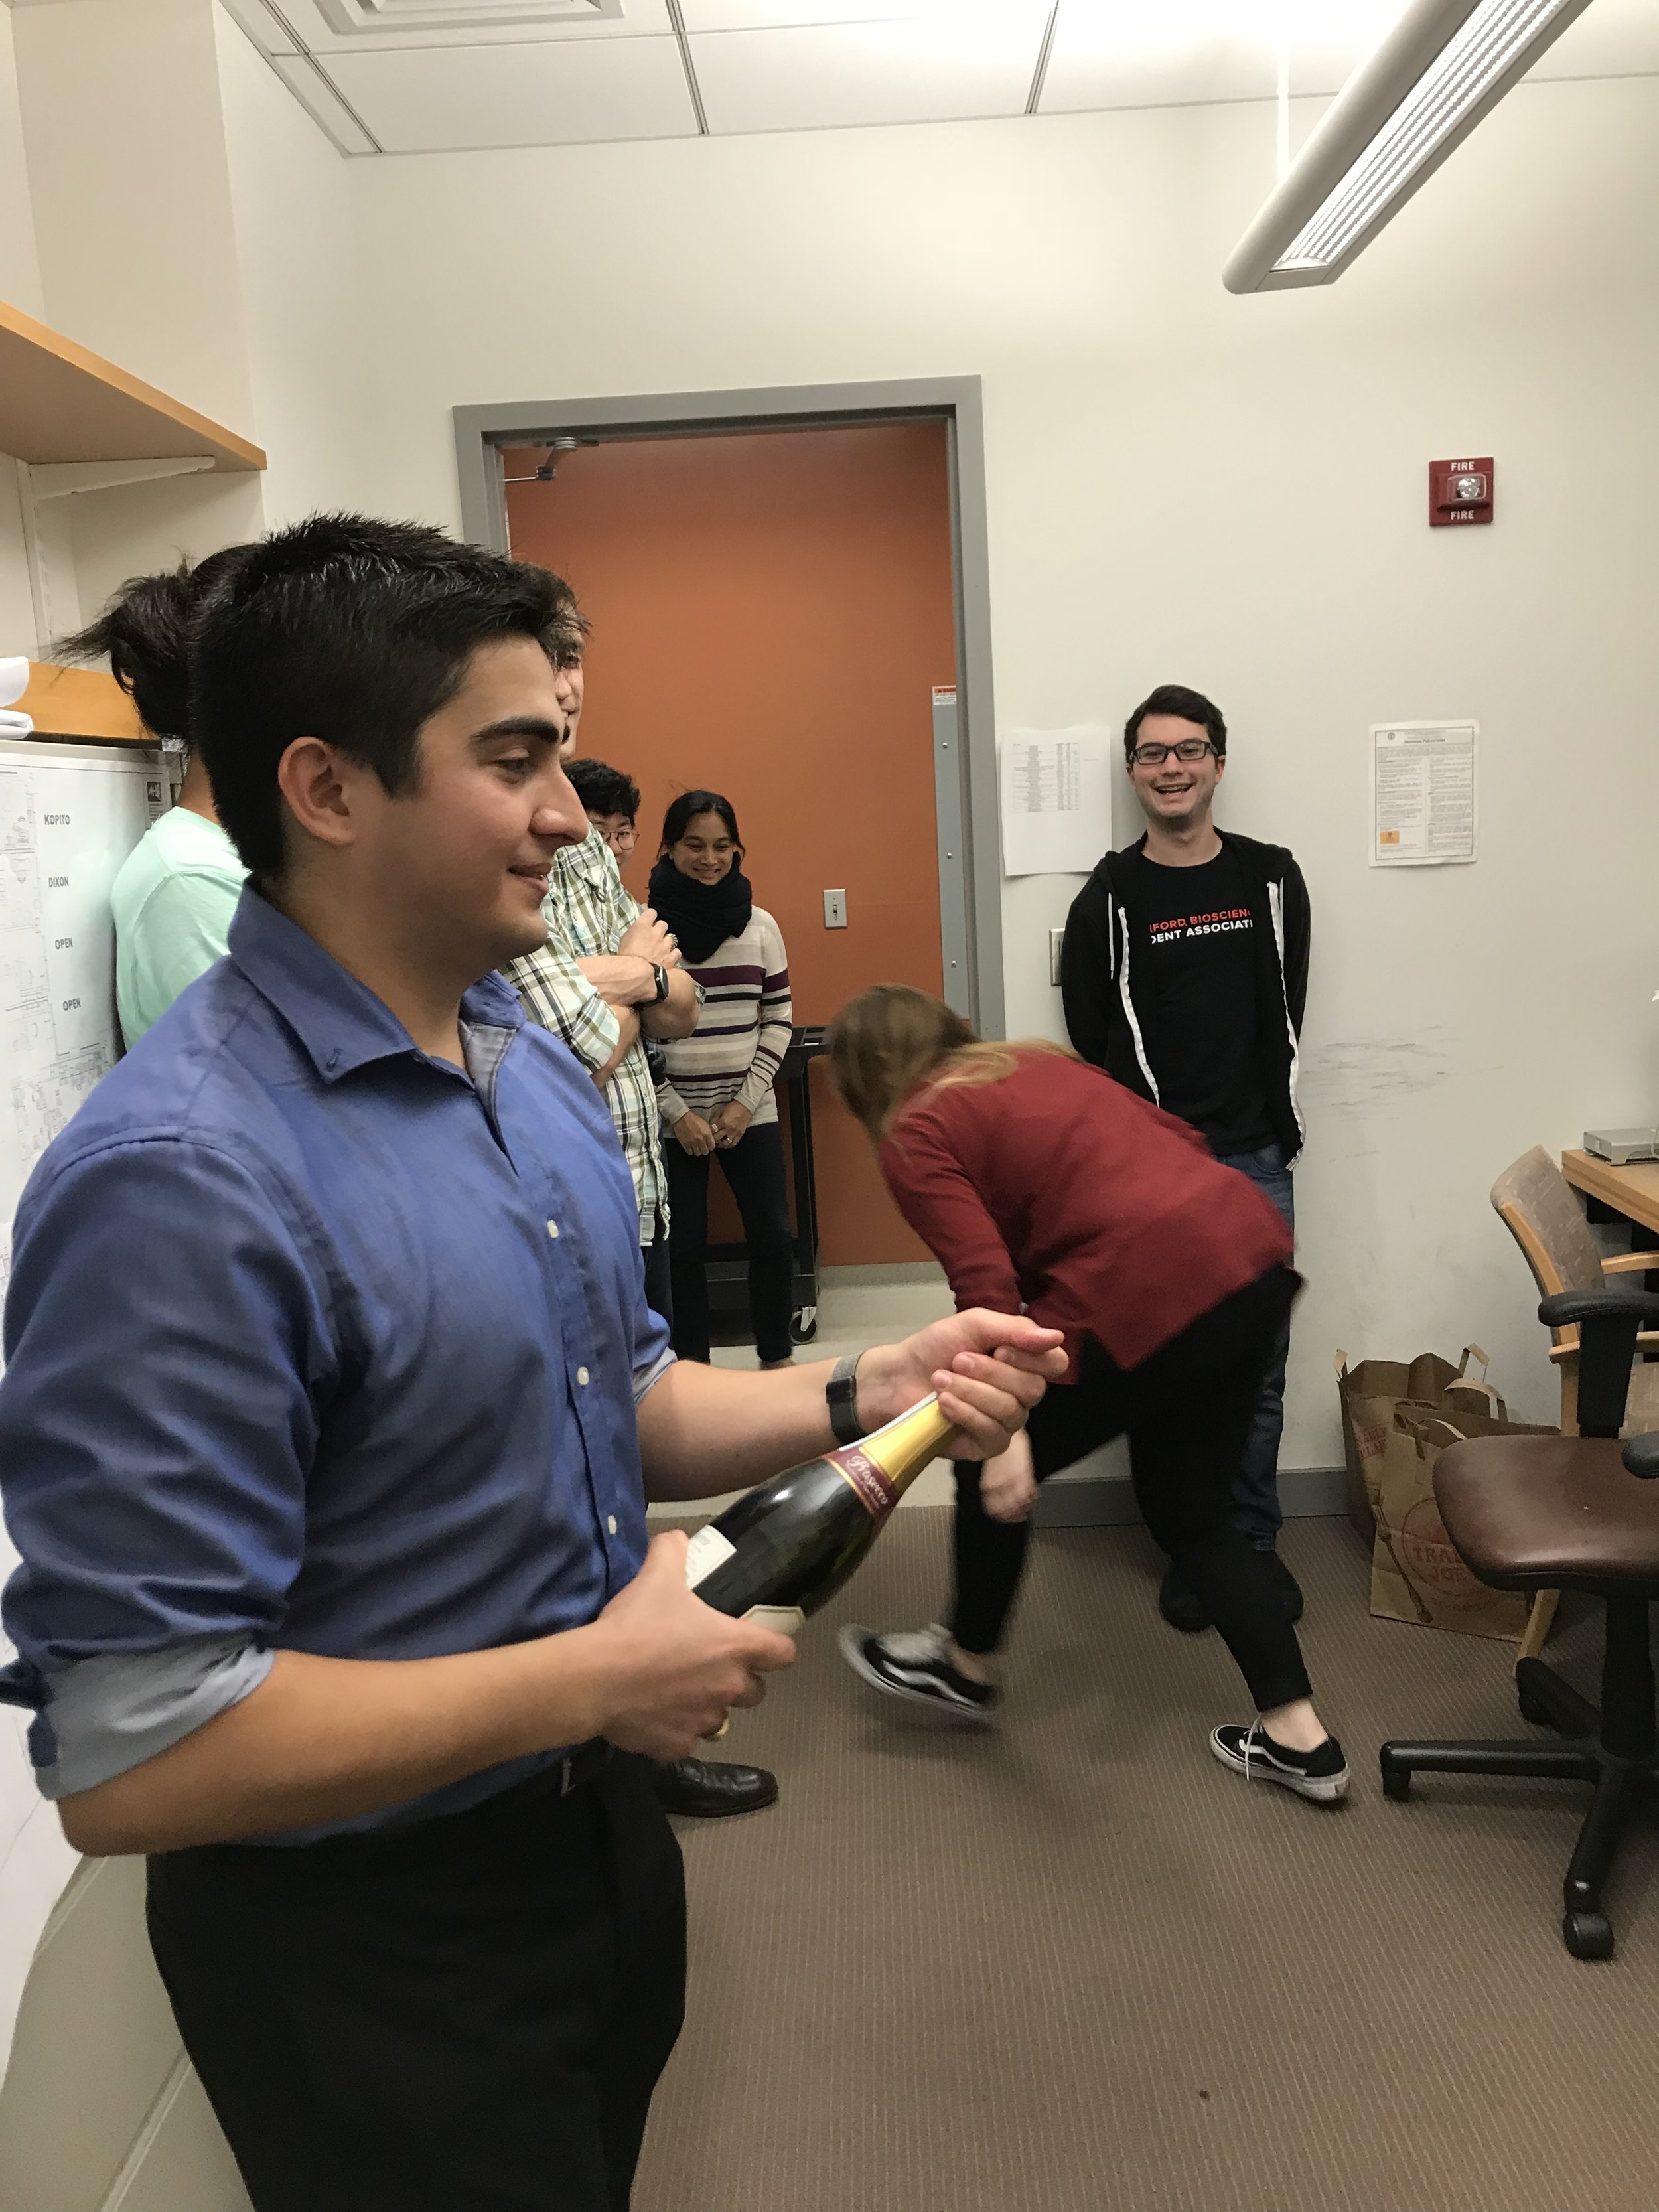 David successfully completes his Ph.D. qualifying exam. Congrats to David! - 2 November 18